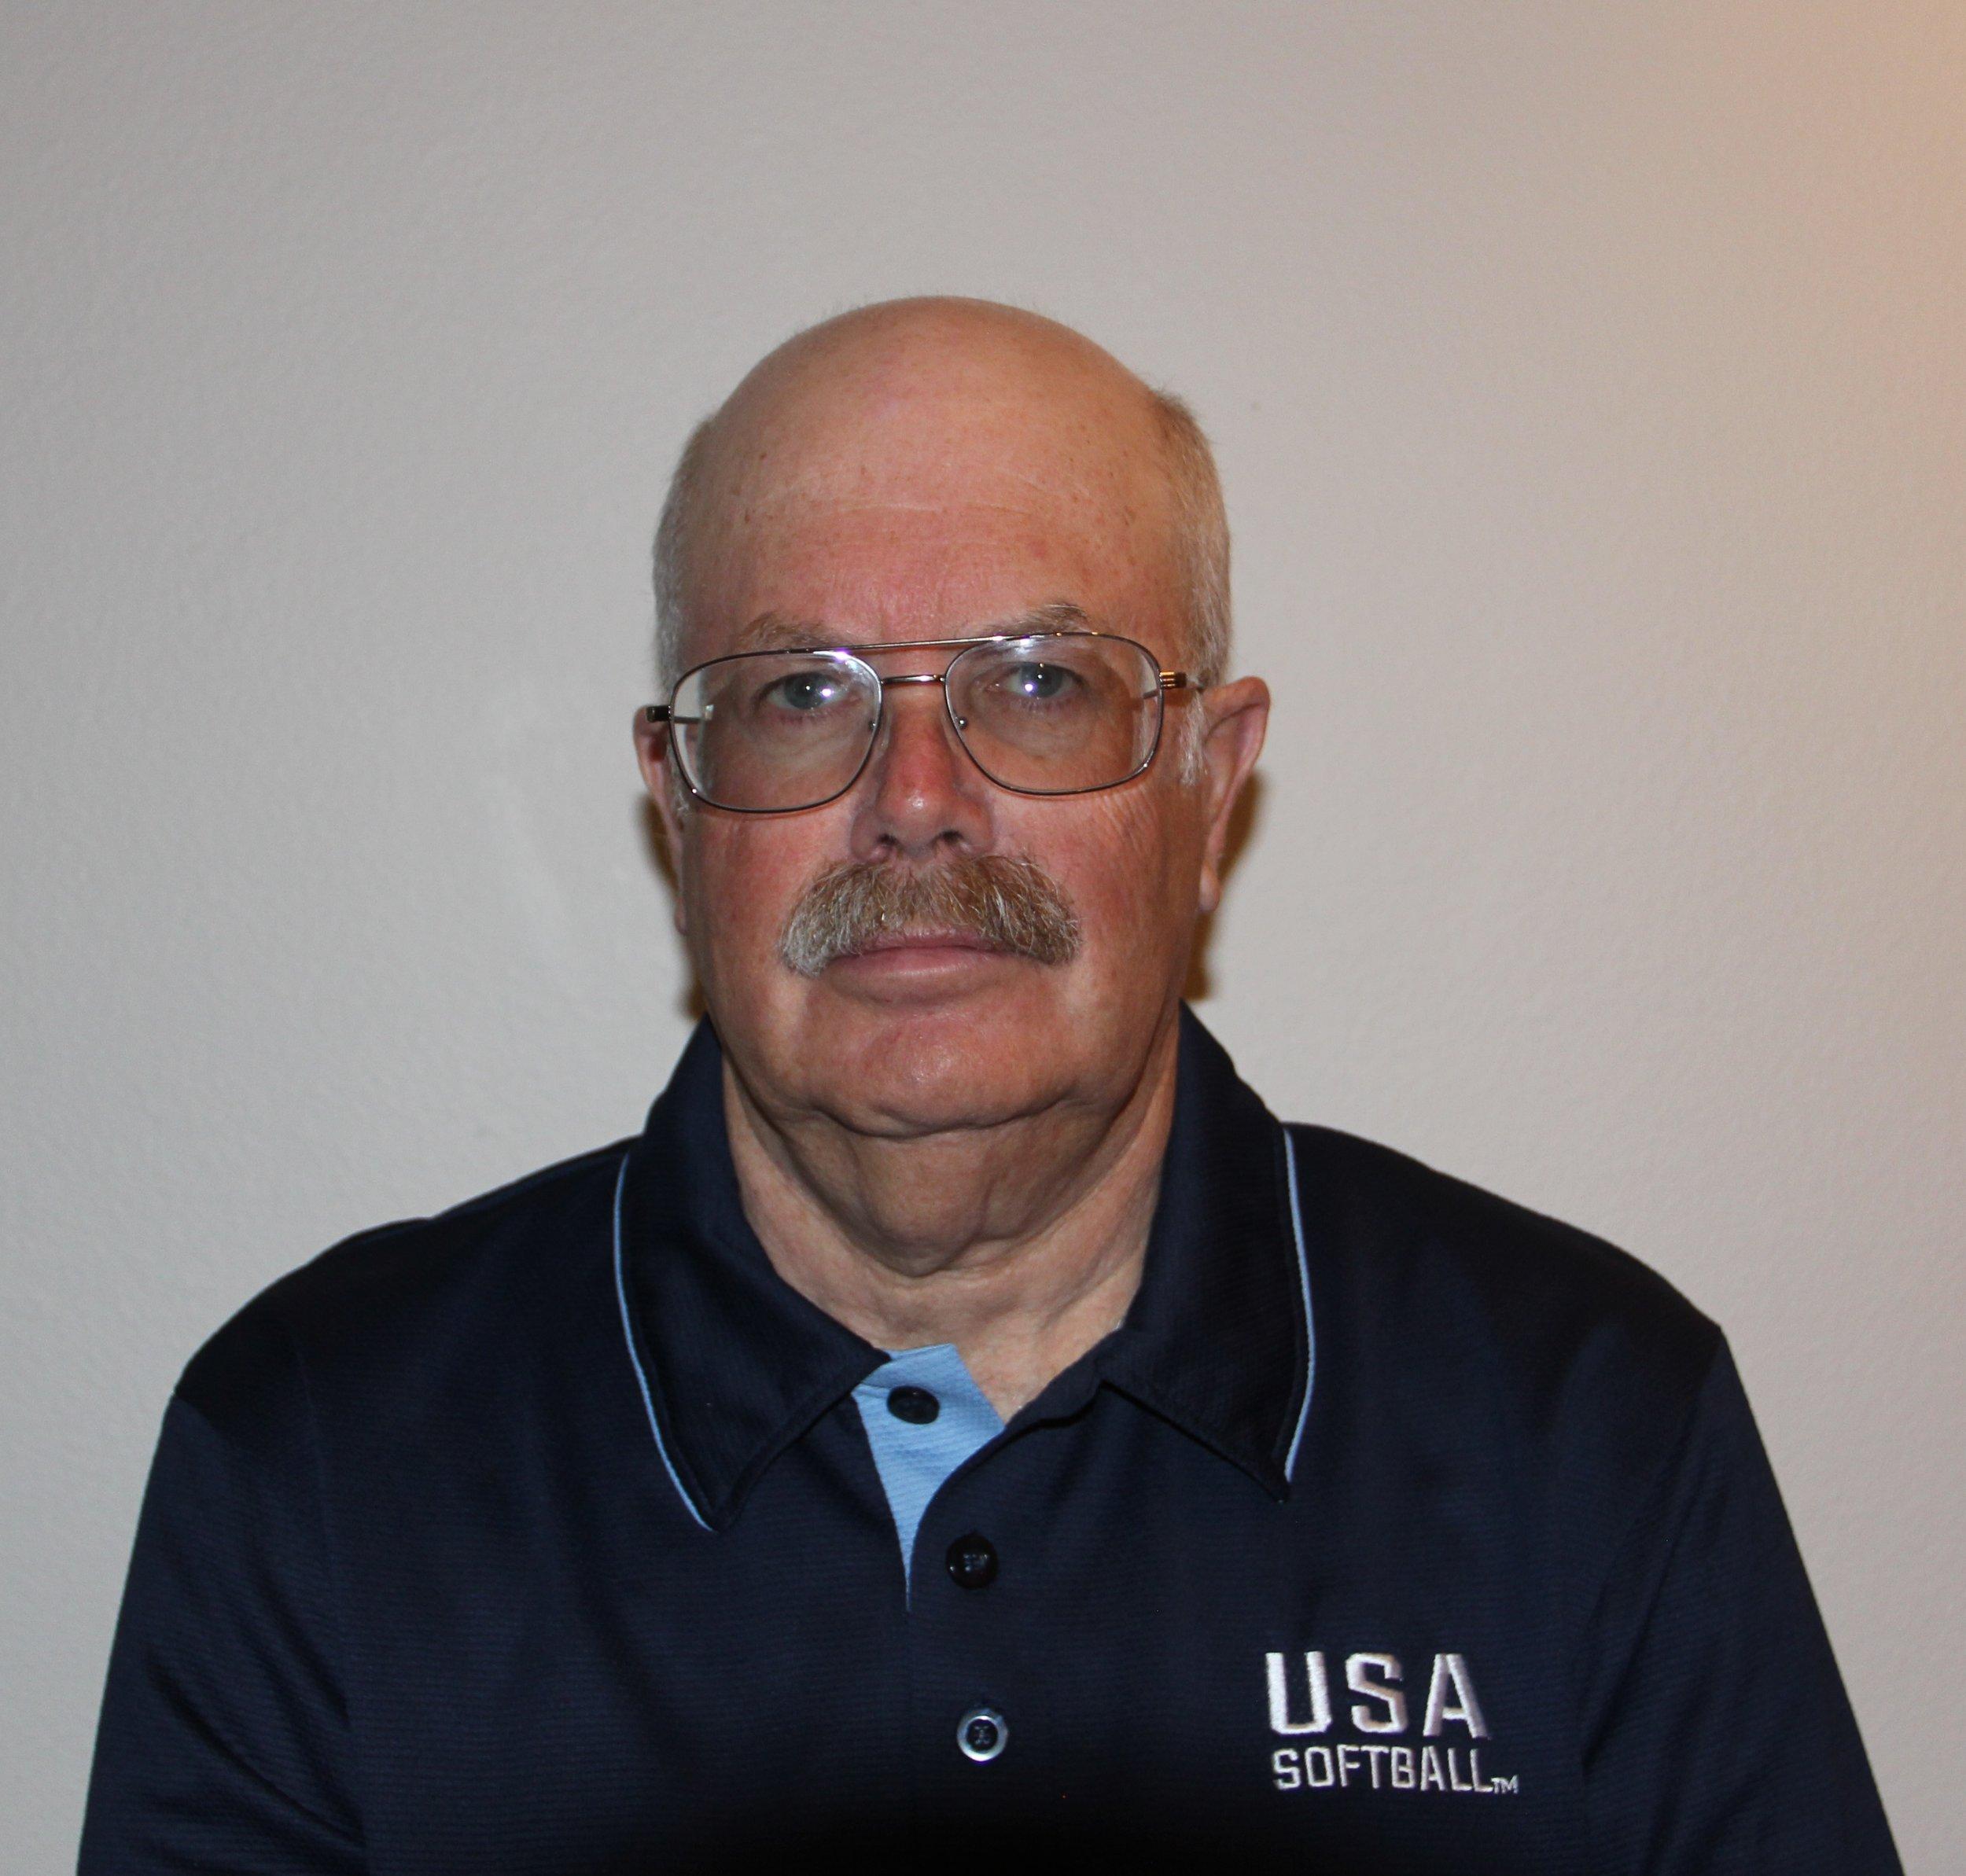 State UIC/Treasurer - Jerry Kramer